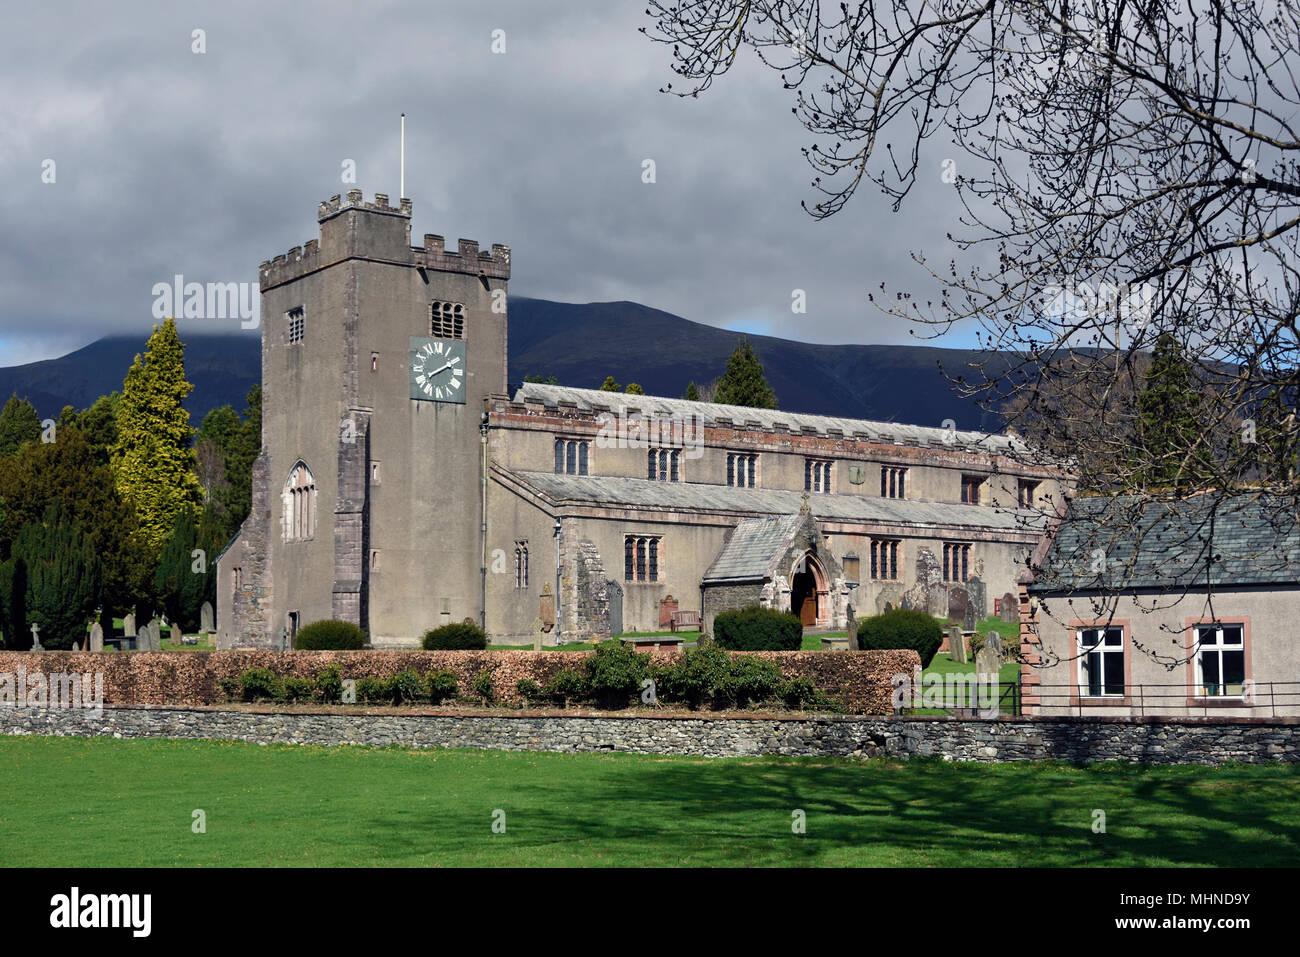 Parish Church of Saint Kentigern, Great Crosthwaite, Lake District National Park, Cumbria, England, United Kingdom, Europe. - Stock Image